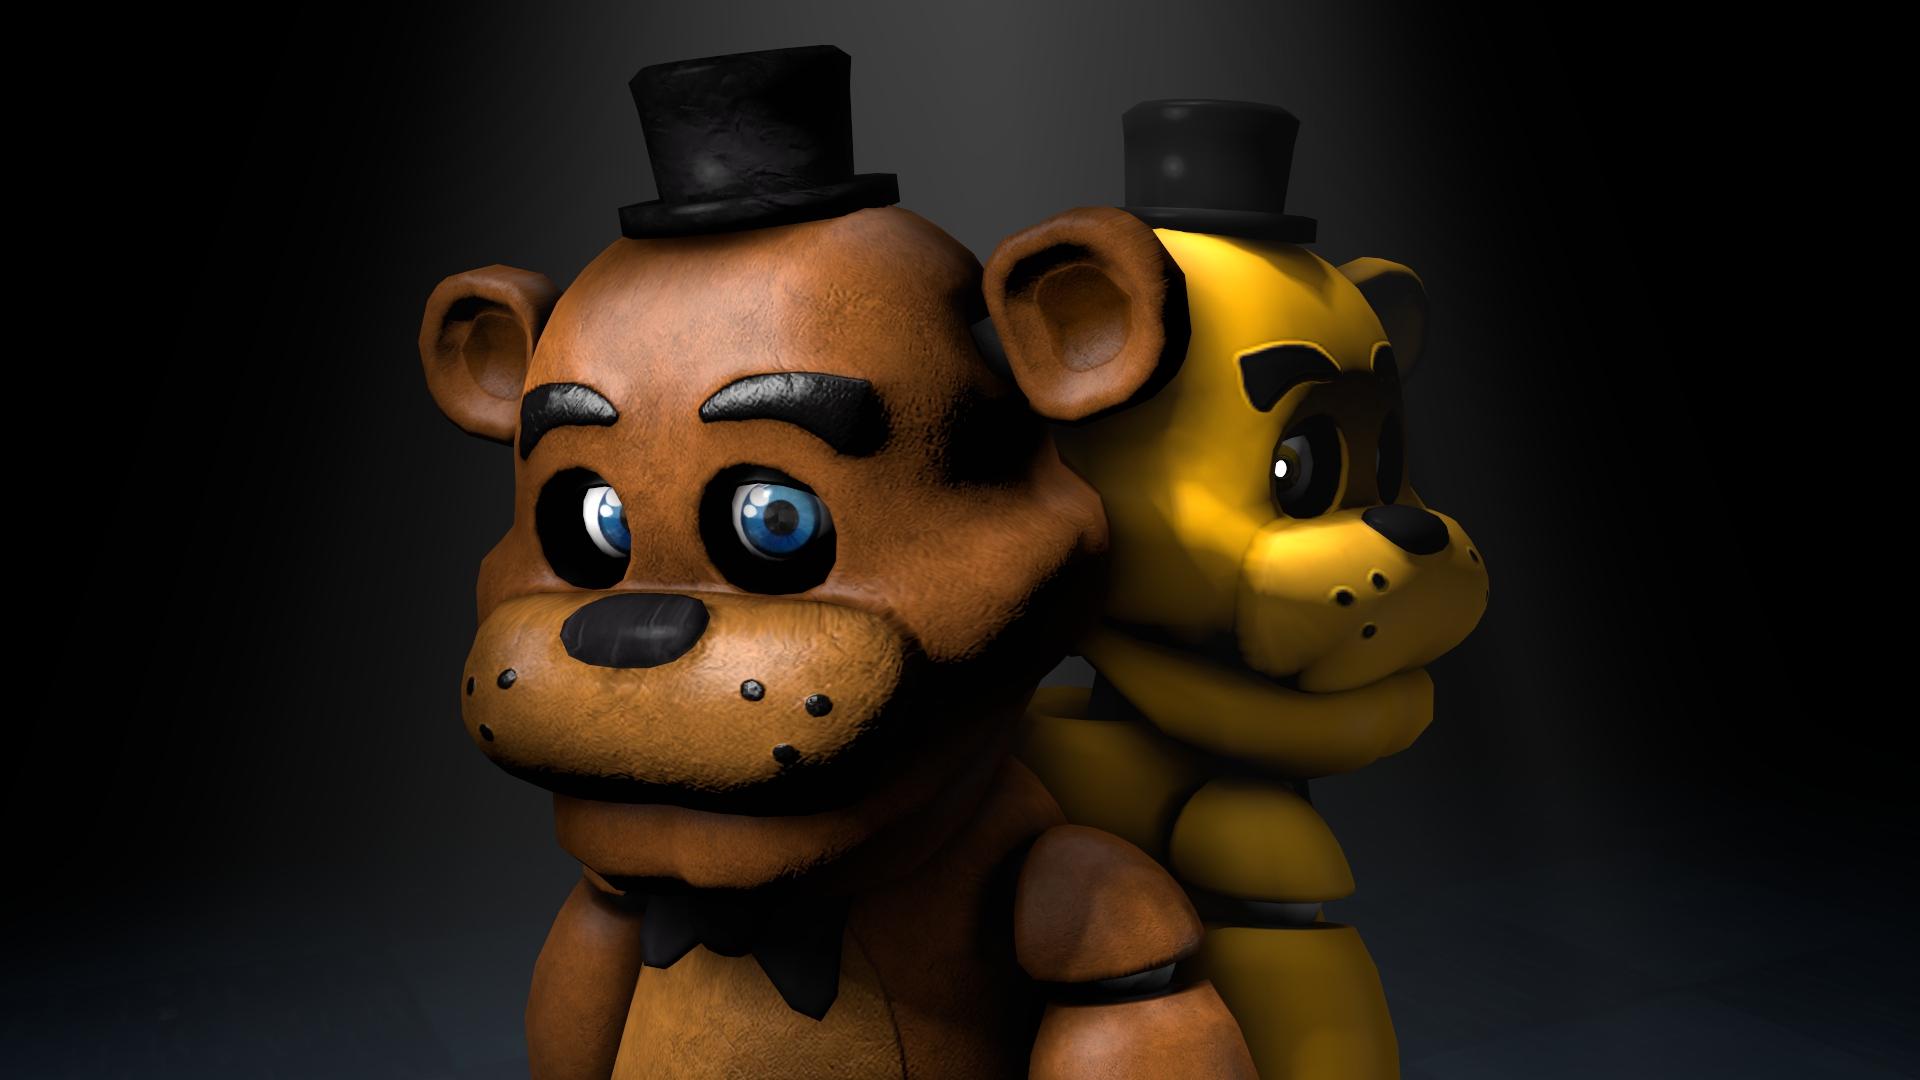 Freddy and Golden Freddy by TalonDang 1920x1080